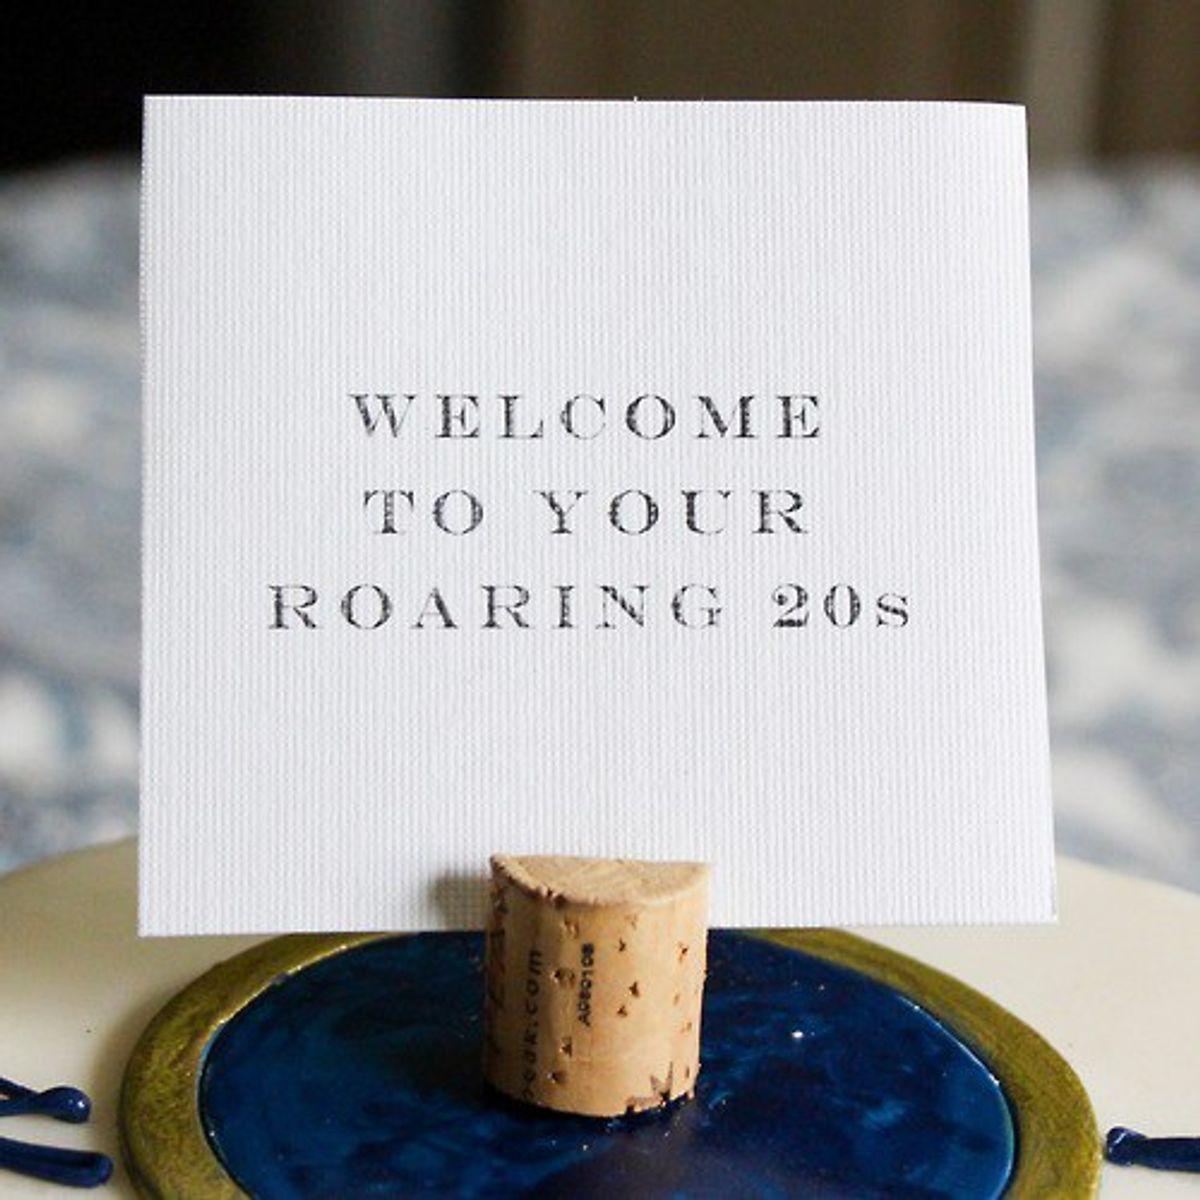 Why Turning 20 is Worth Celebrating